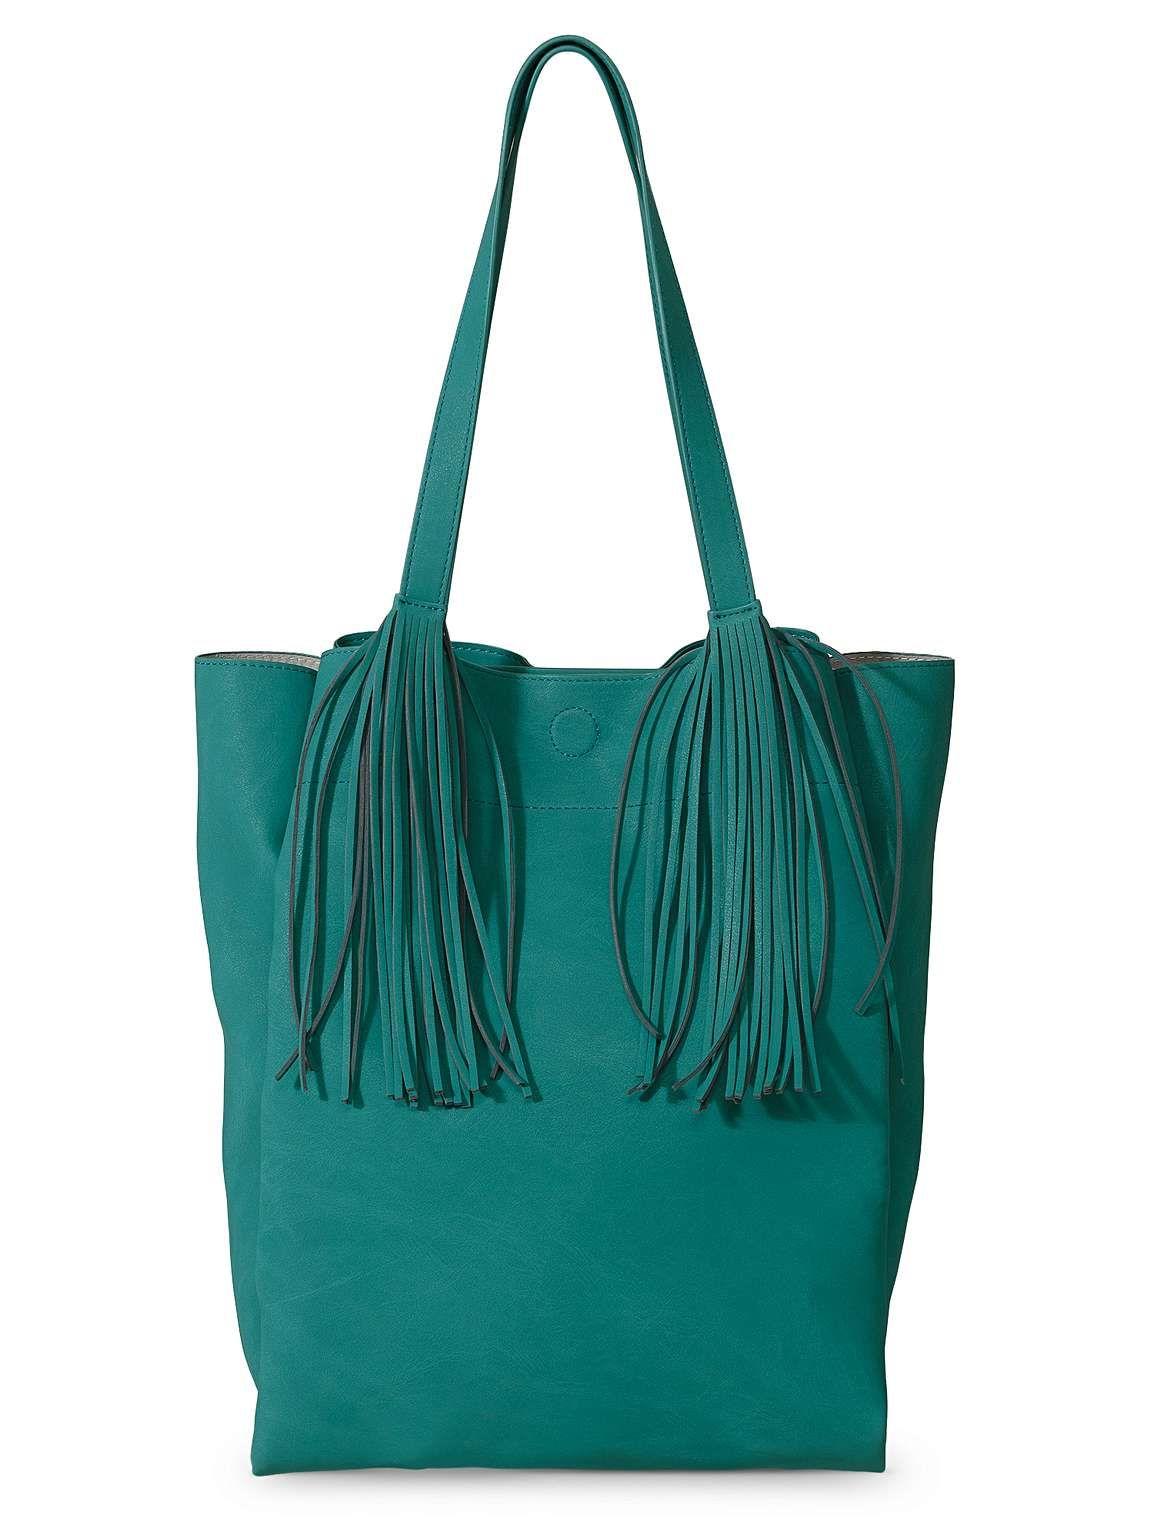 28ed2b4c55 Abi Green Tassel Tote Bag in 2019   My Style   Tote Bag, Bags, Tassels